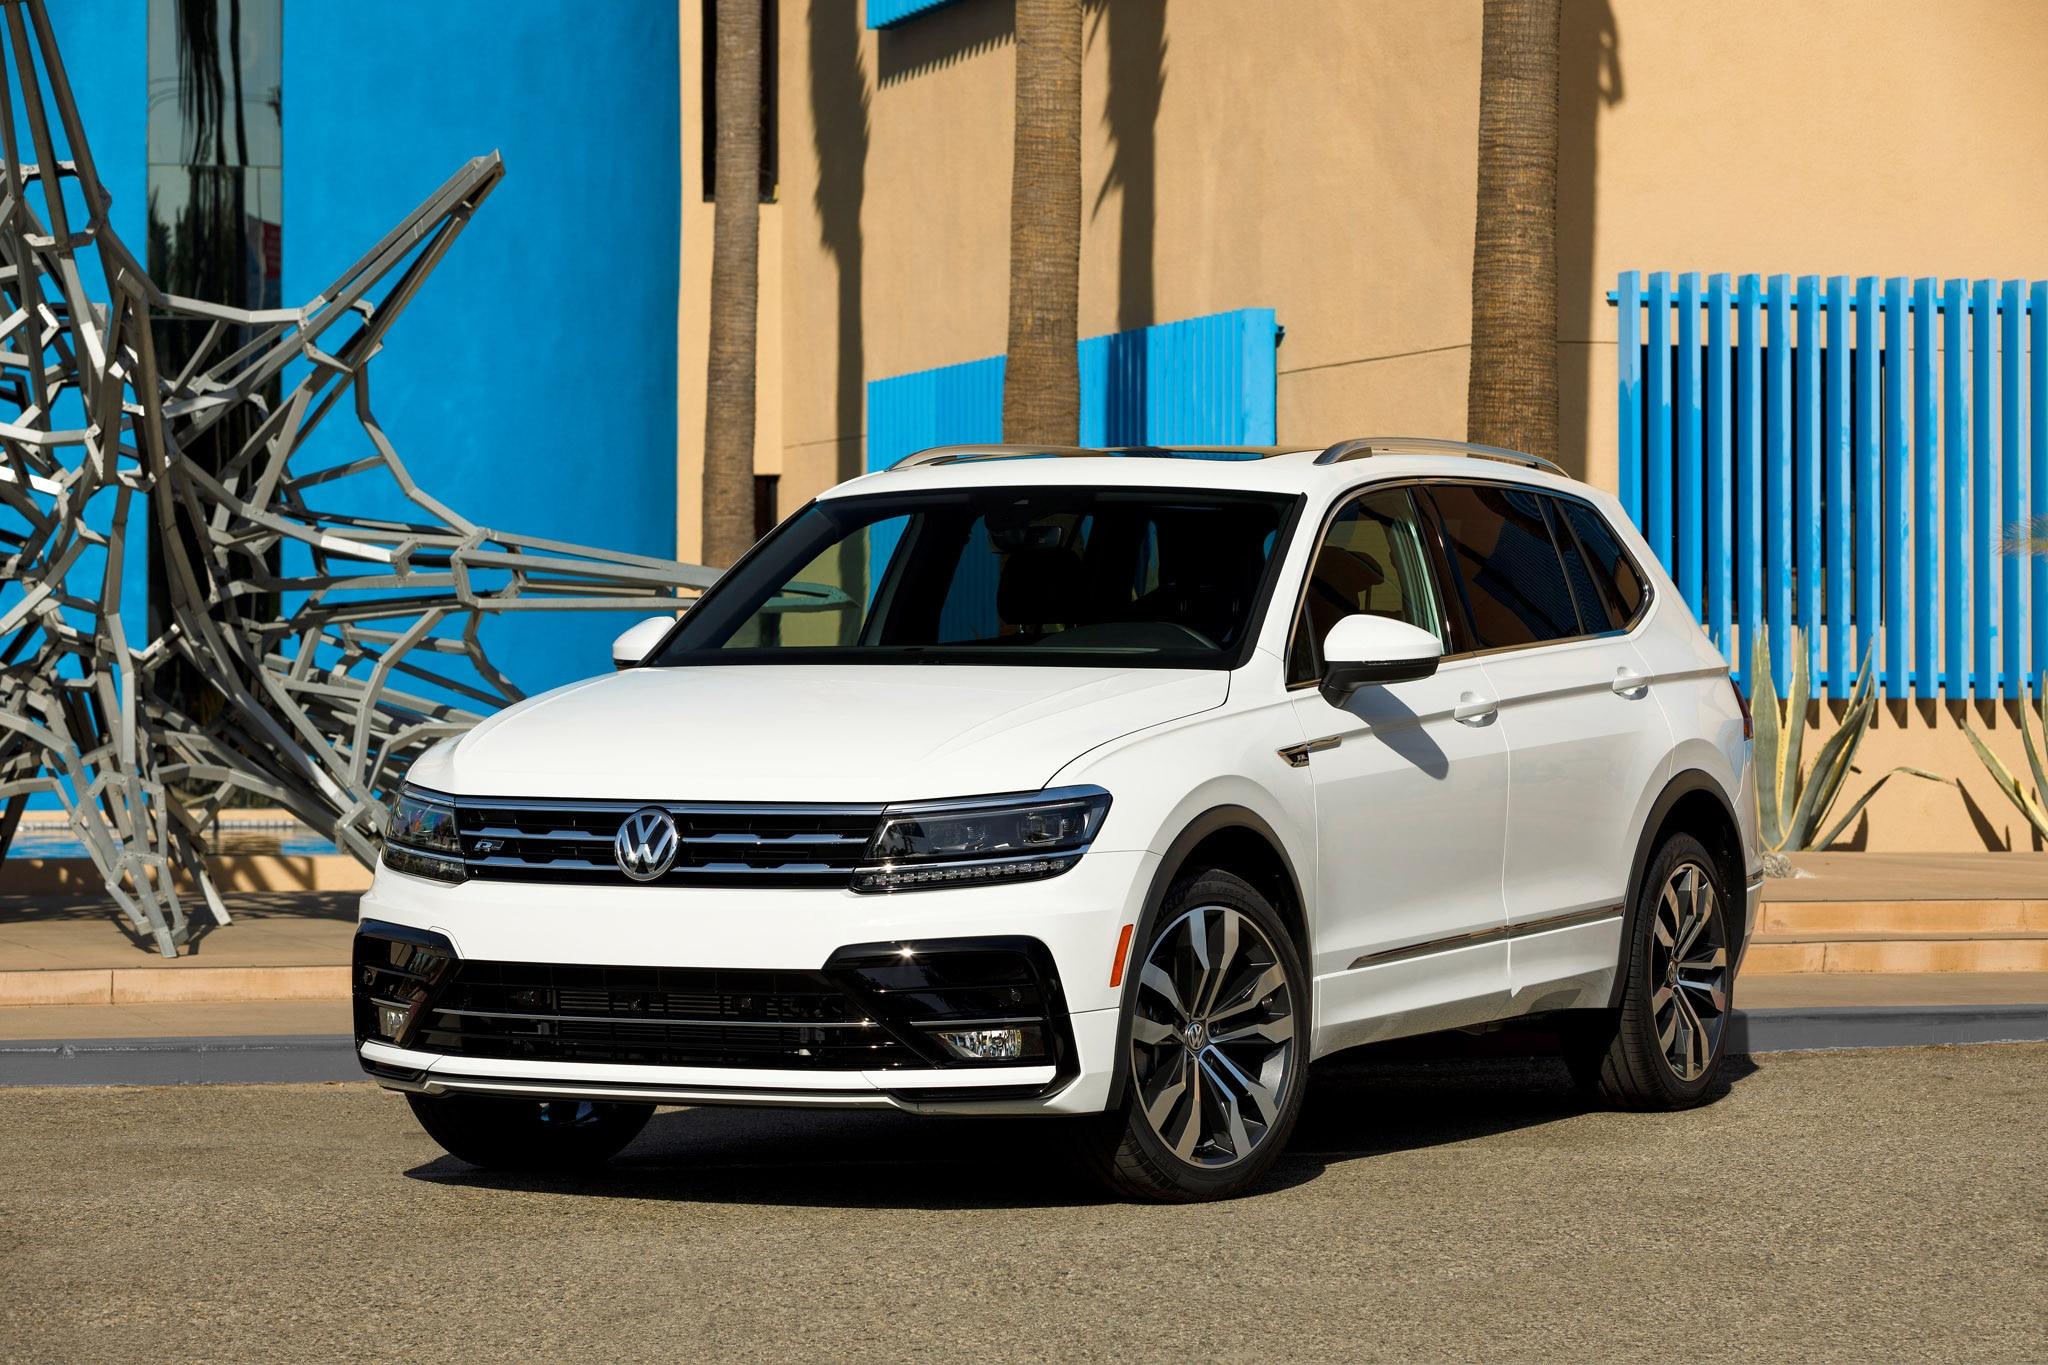 2018 Volkswagen Tiguan R Line Front Three Quarter